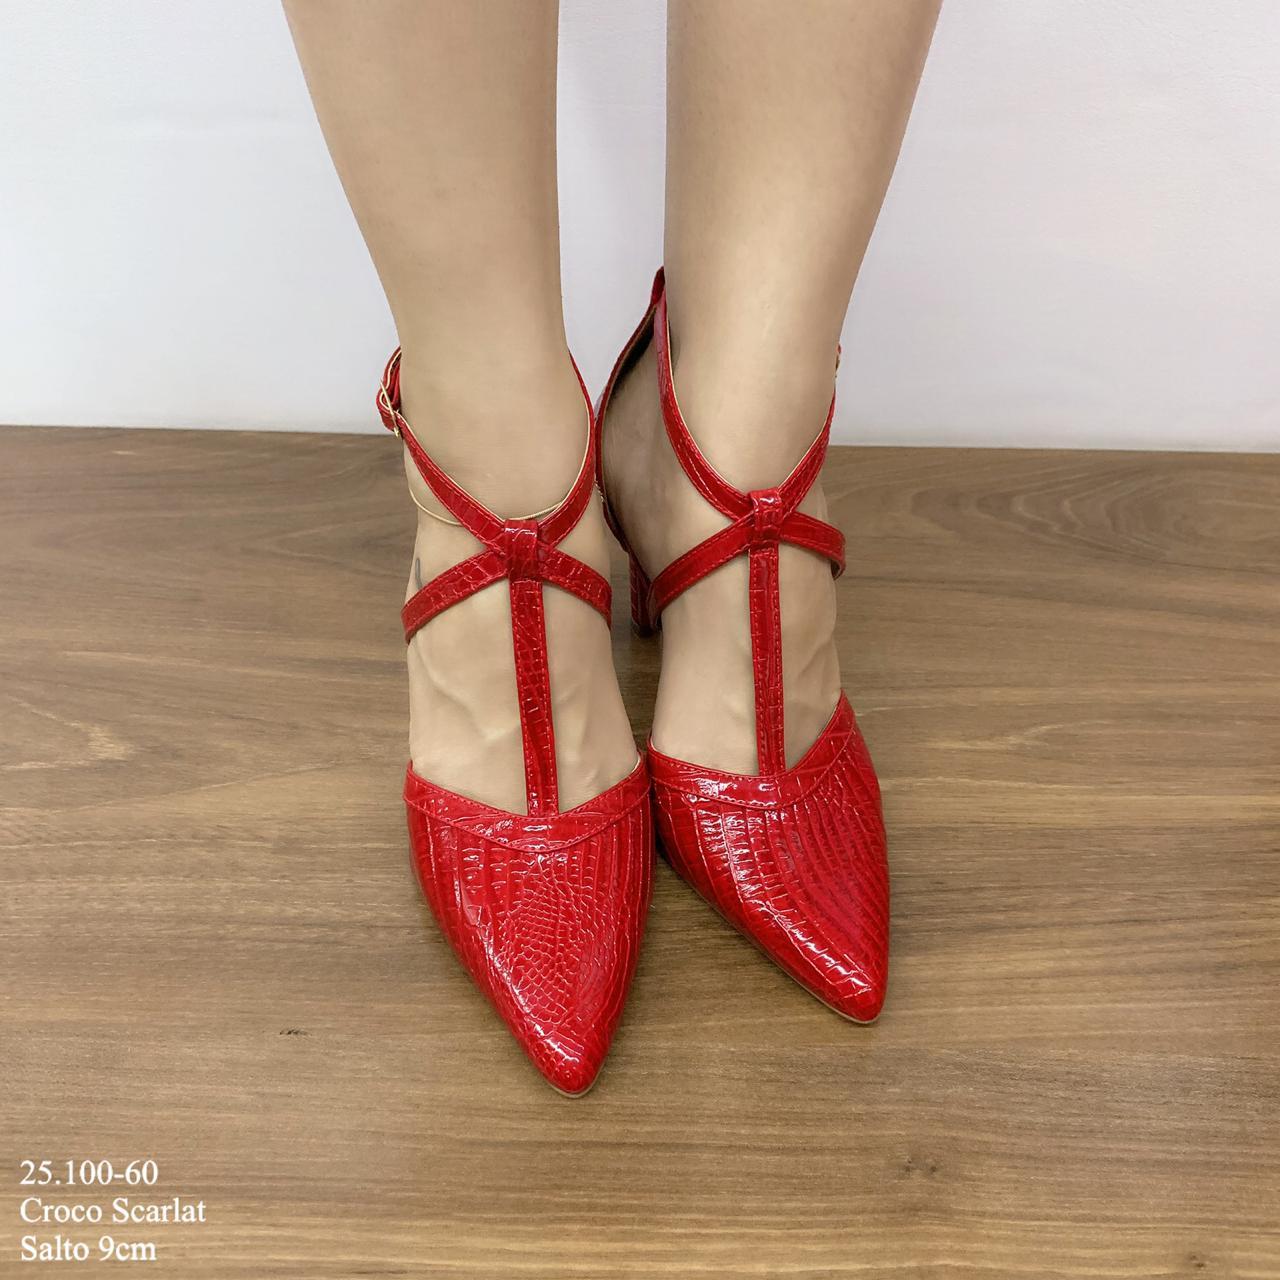 Scarpin Feminino Scarlat Croco   25.100-60